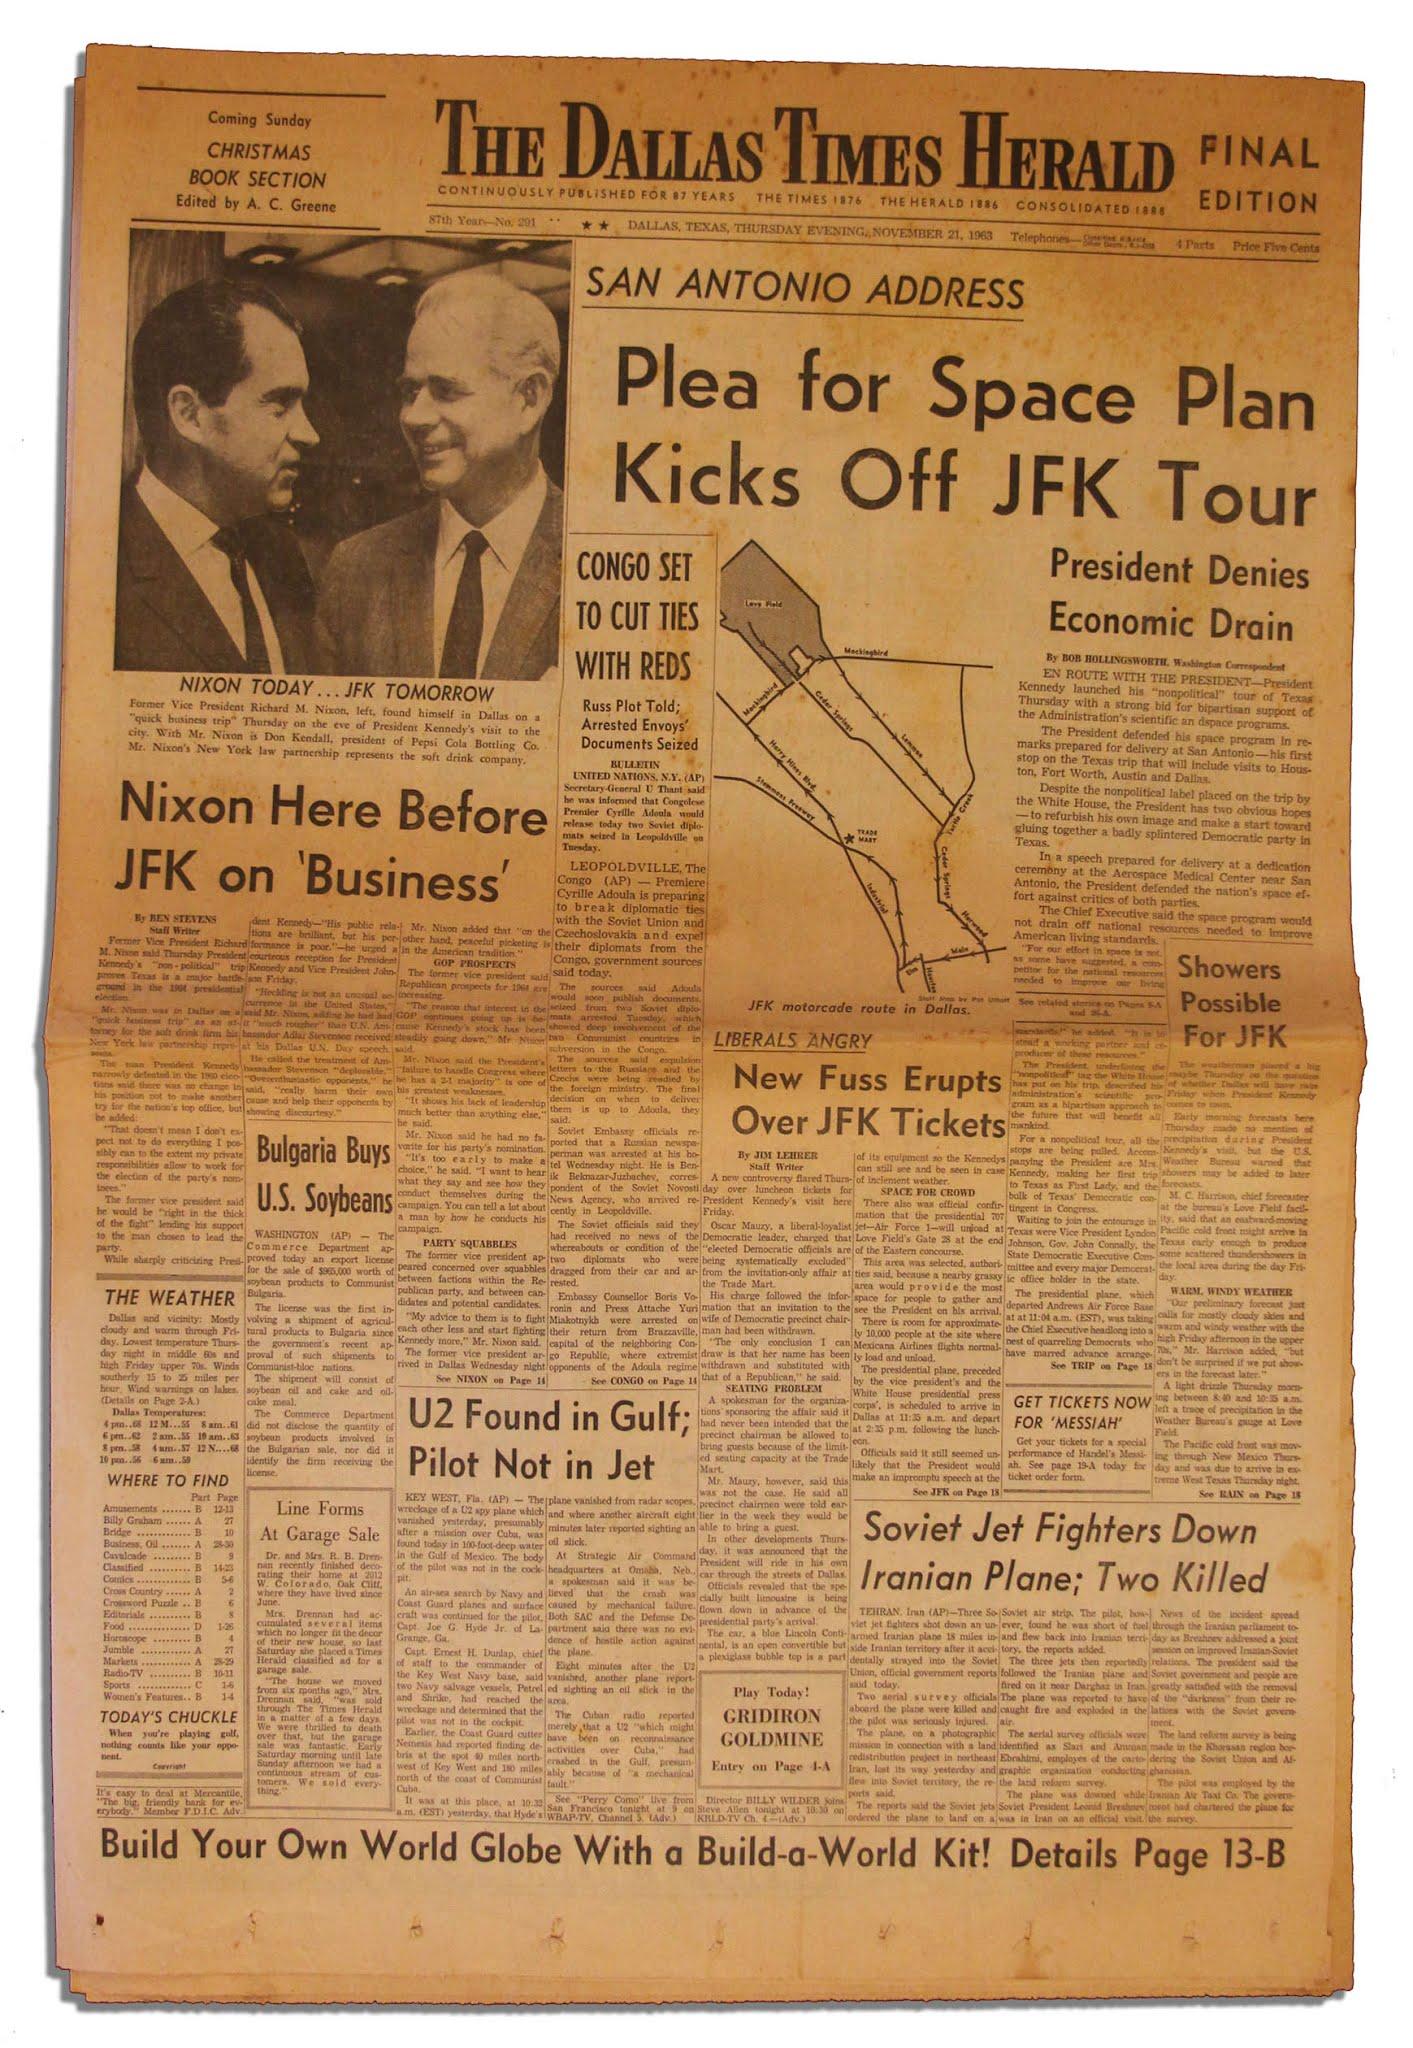 Dallas-Times-Herald-11-21-63.jpeg